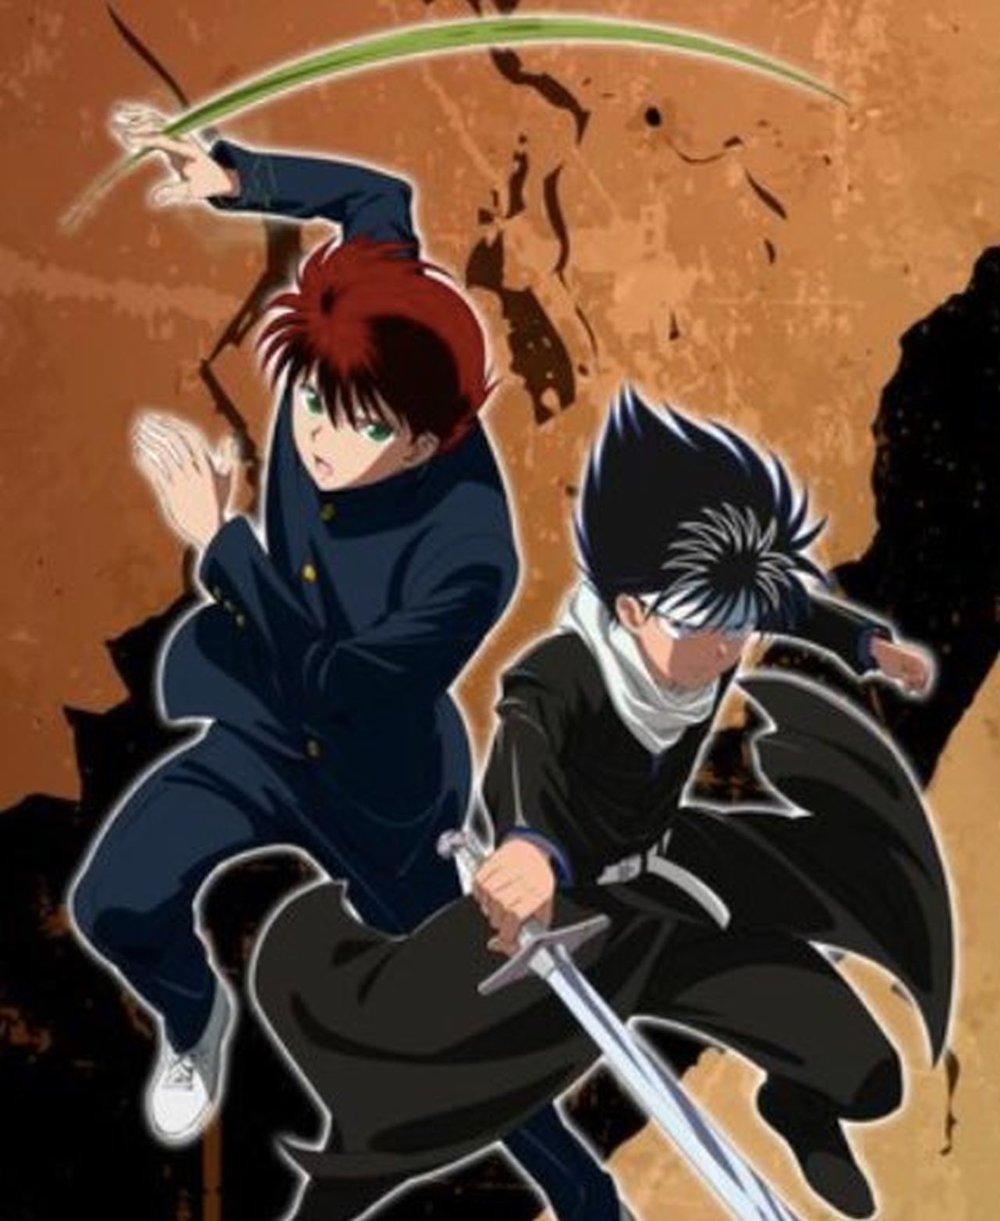 Character Designs For New YU YU HAKUSHO OVA Shared